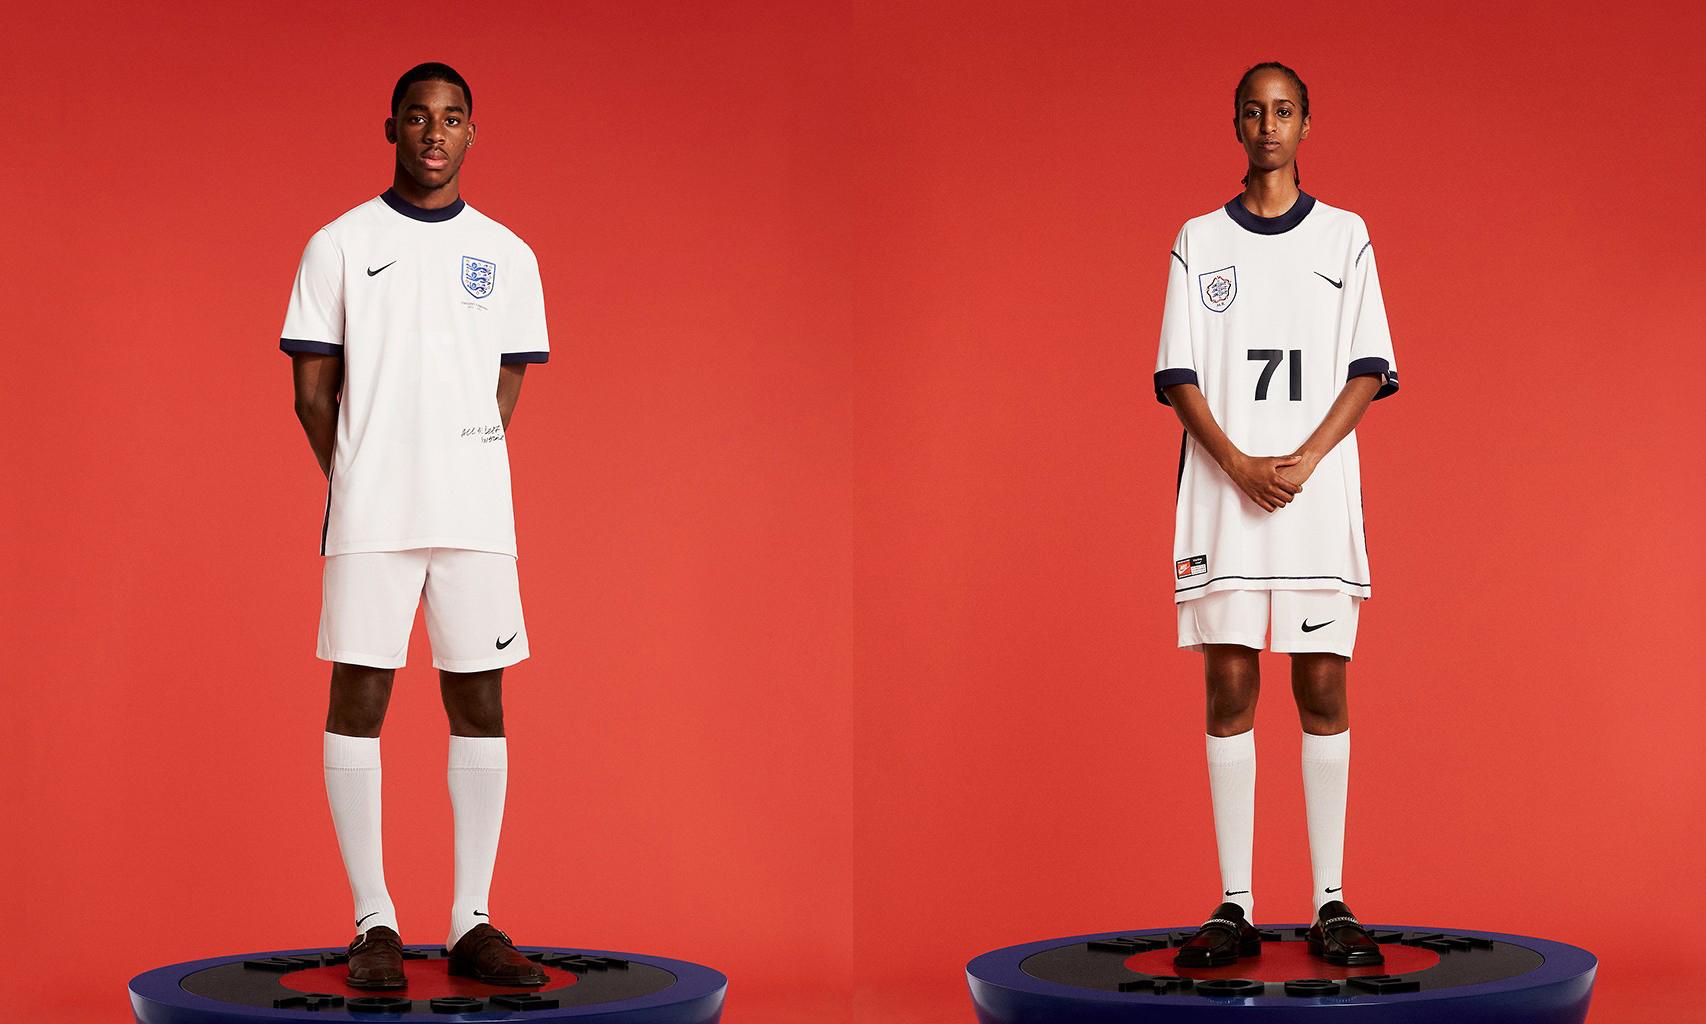 Martine Rose x Nike「Lost Lionesses」英格兰球衣系列登场